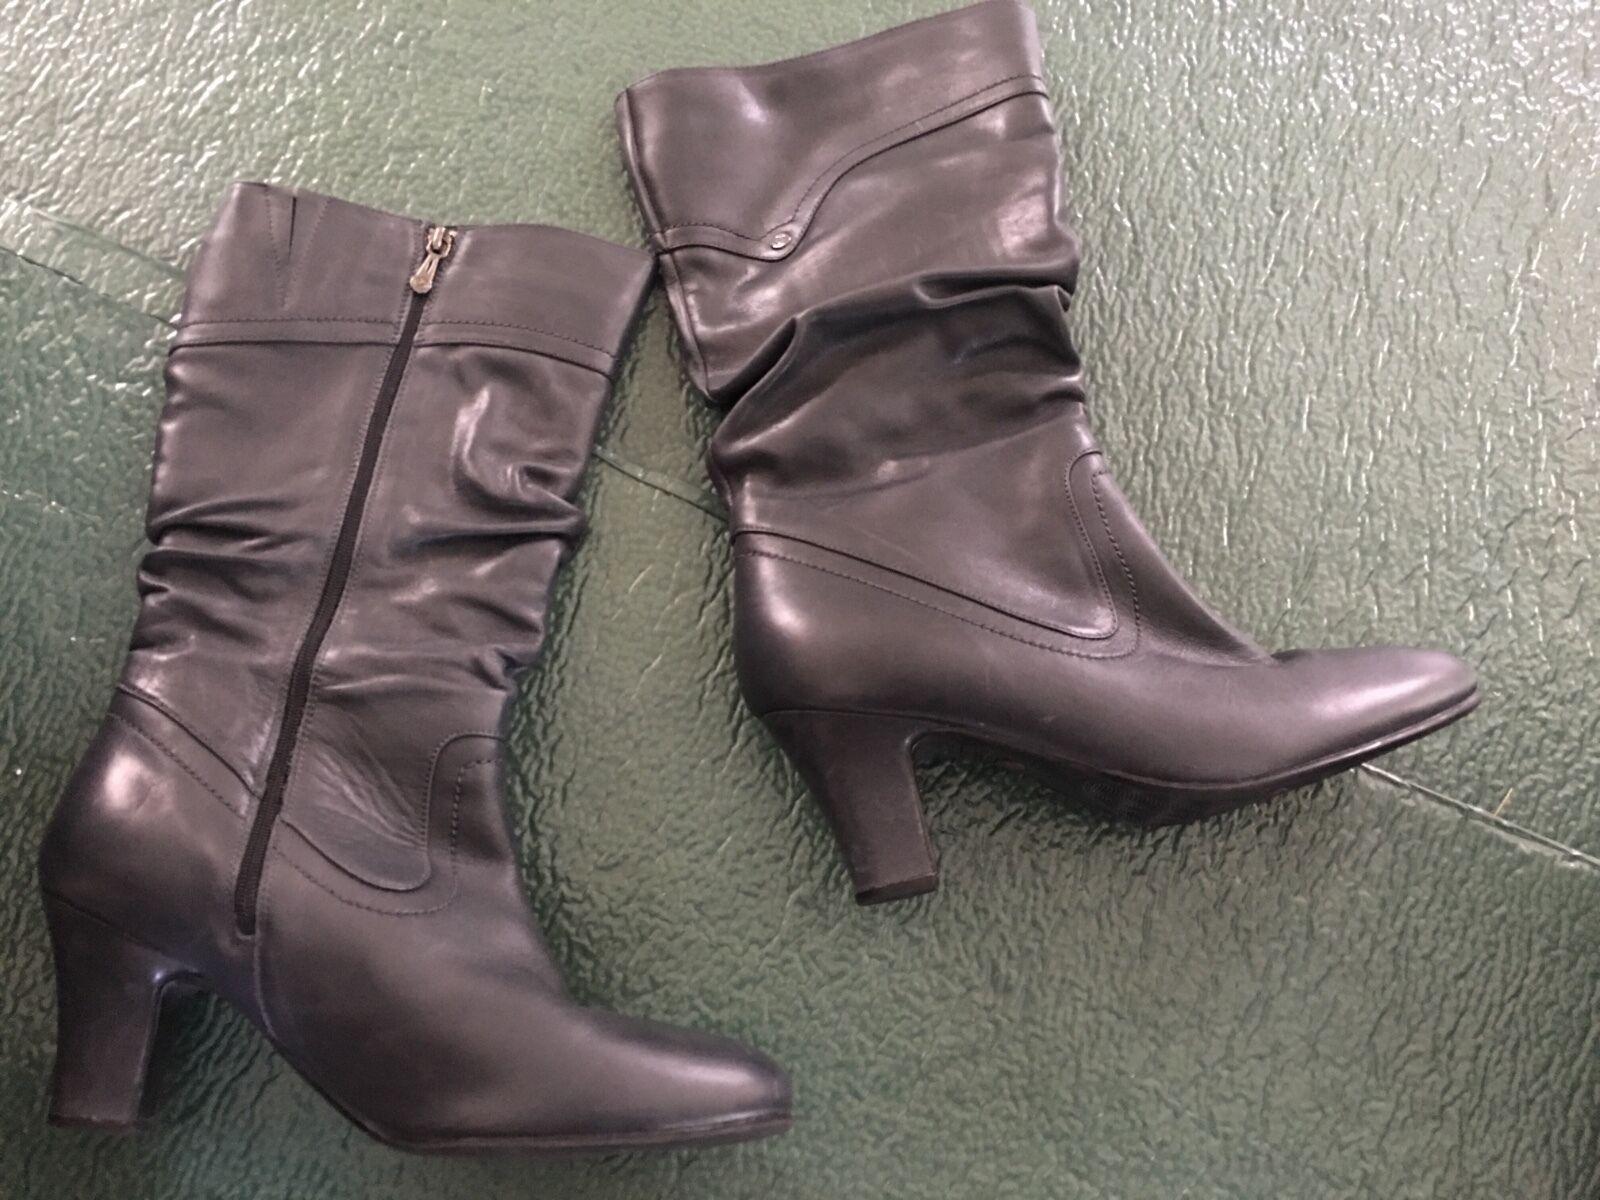 Blondo Aqua Predect Brown Boots Womens size 10